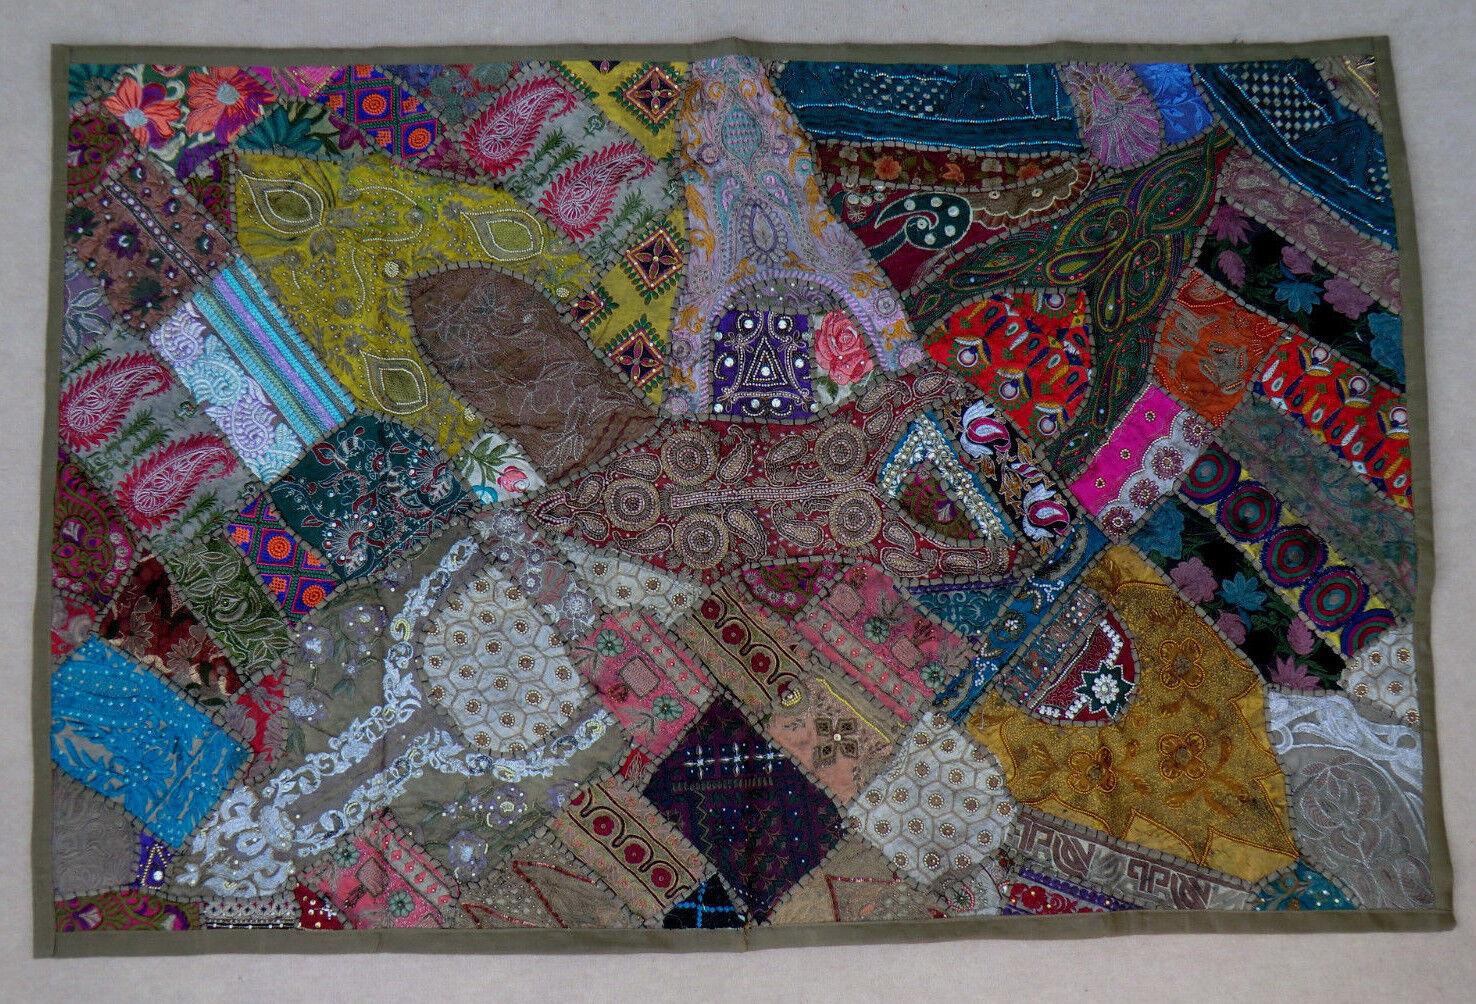 100 x 150 cm Wandteppich Khaki Wandbehang Bollywood Rajasthan Patchwork Sari  | Klein und fein